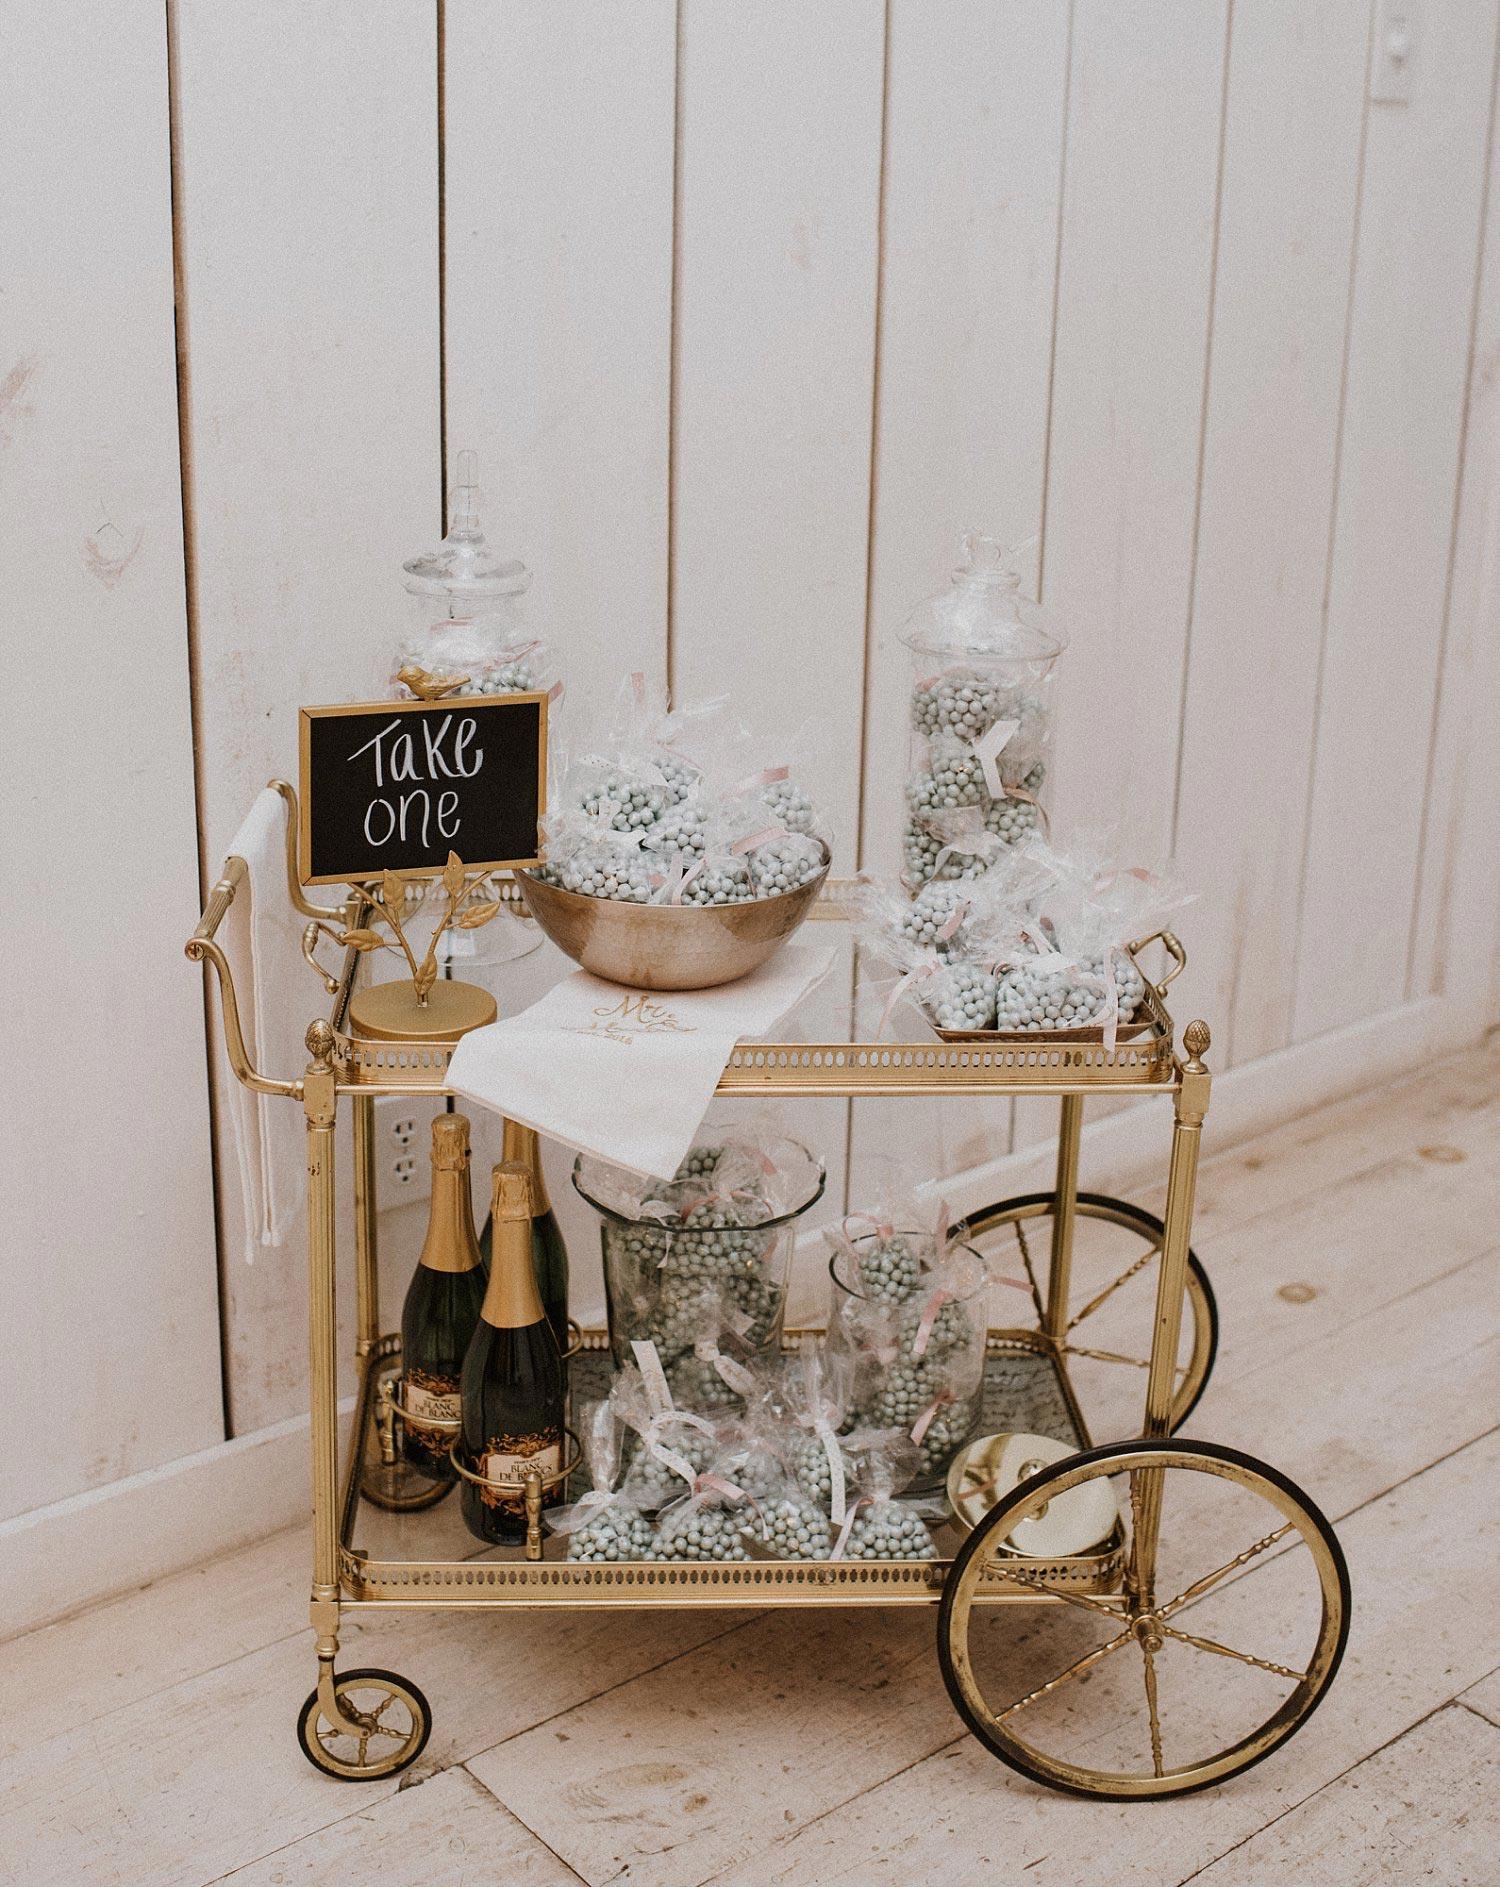 White Sparrow Barn candy cart for wedding favor